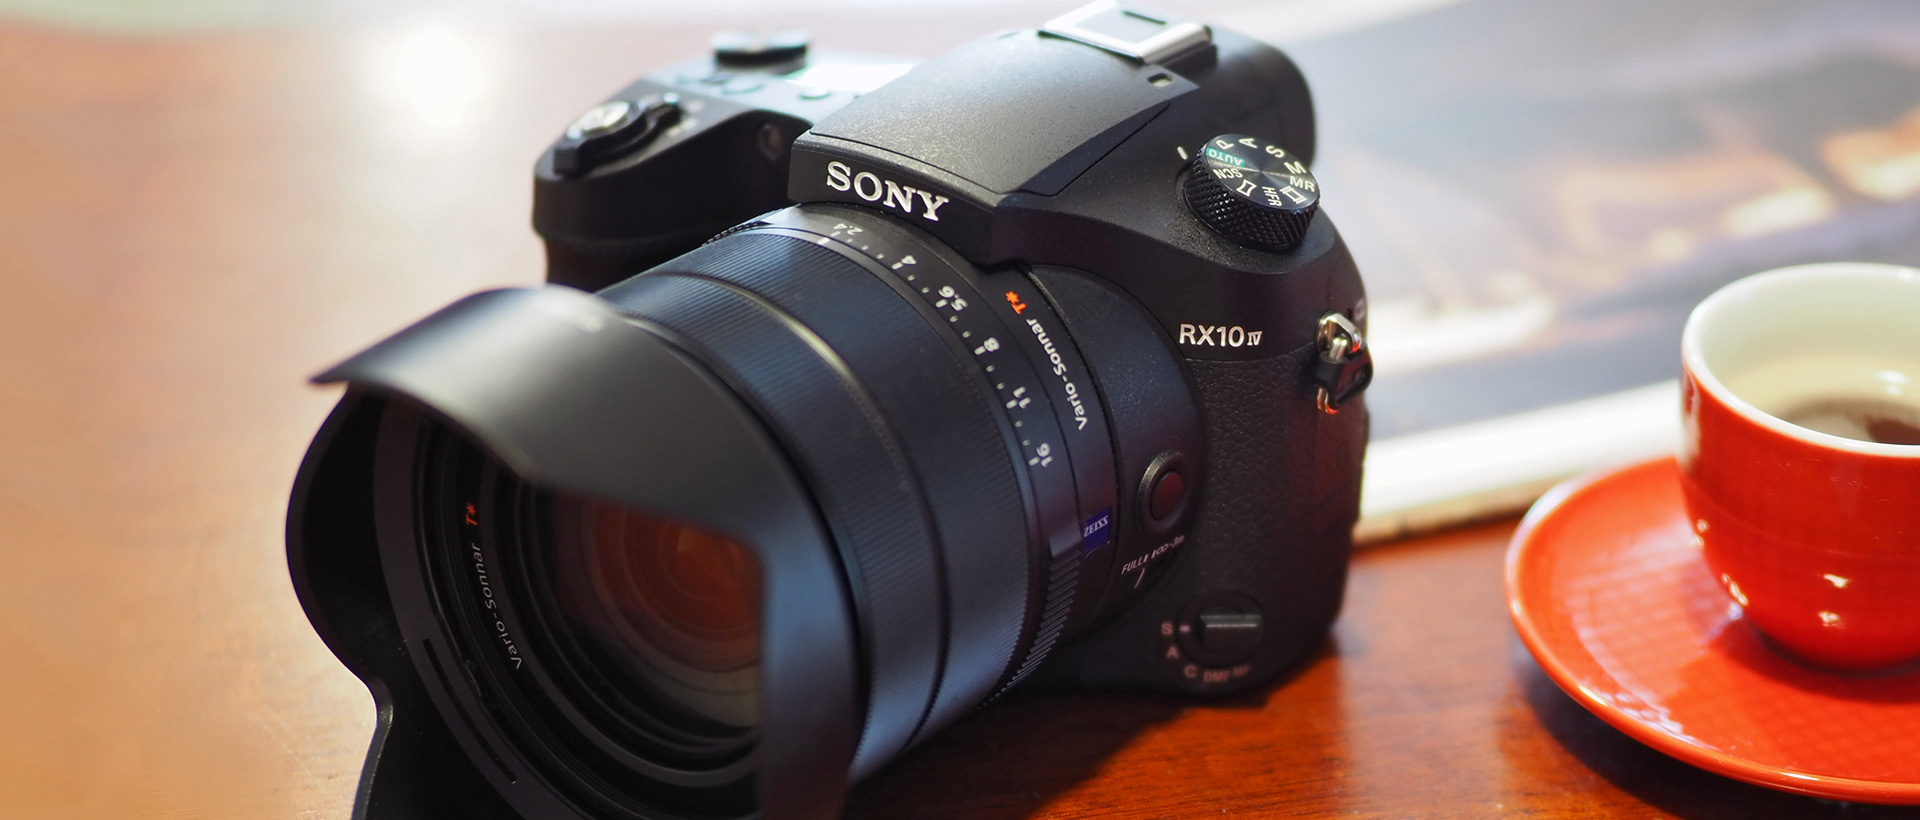 Sony Kompaktkameras Photohaus